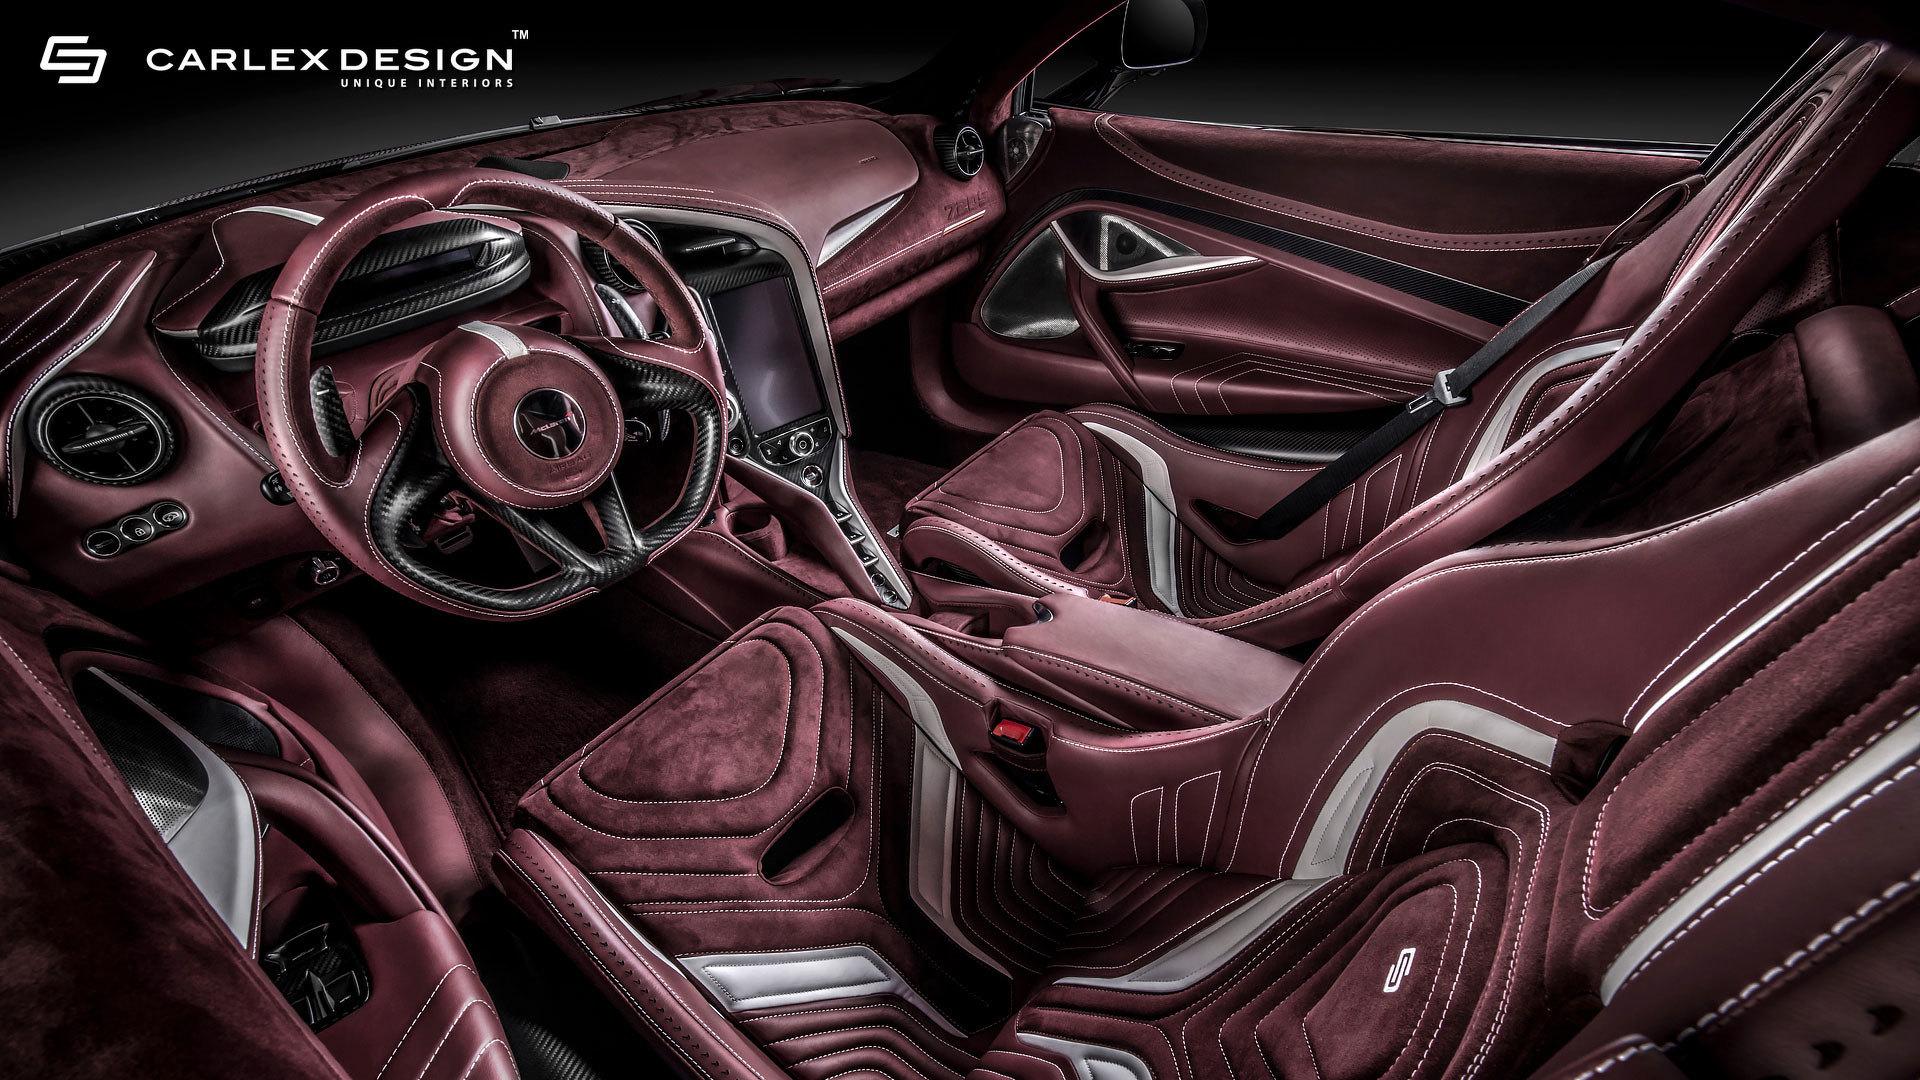 mclaren-720s-by-carlex-design (7)